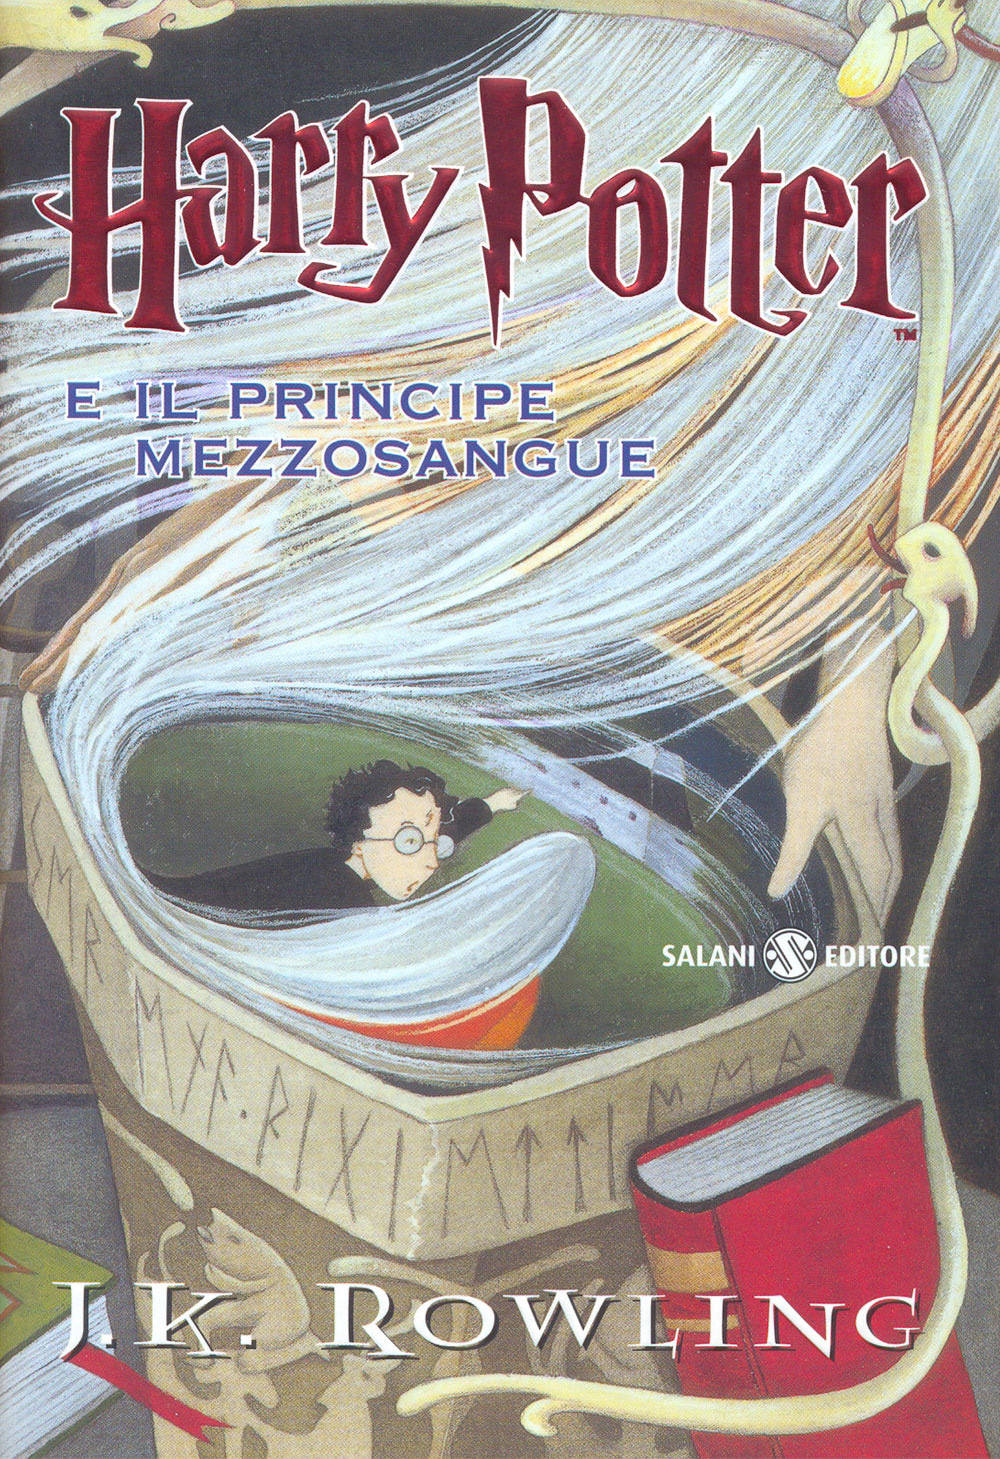 'Half-Blood Prince' Italian edition